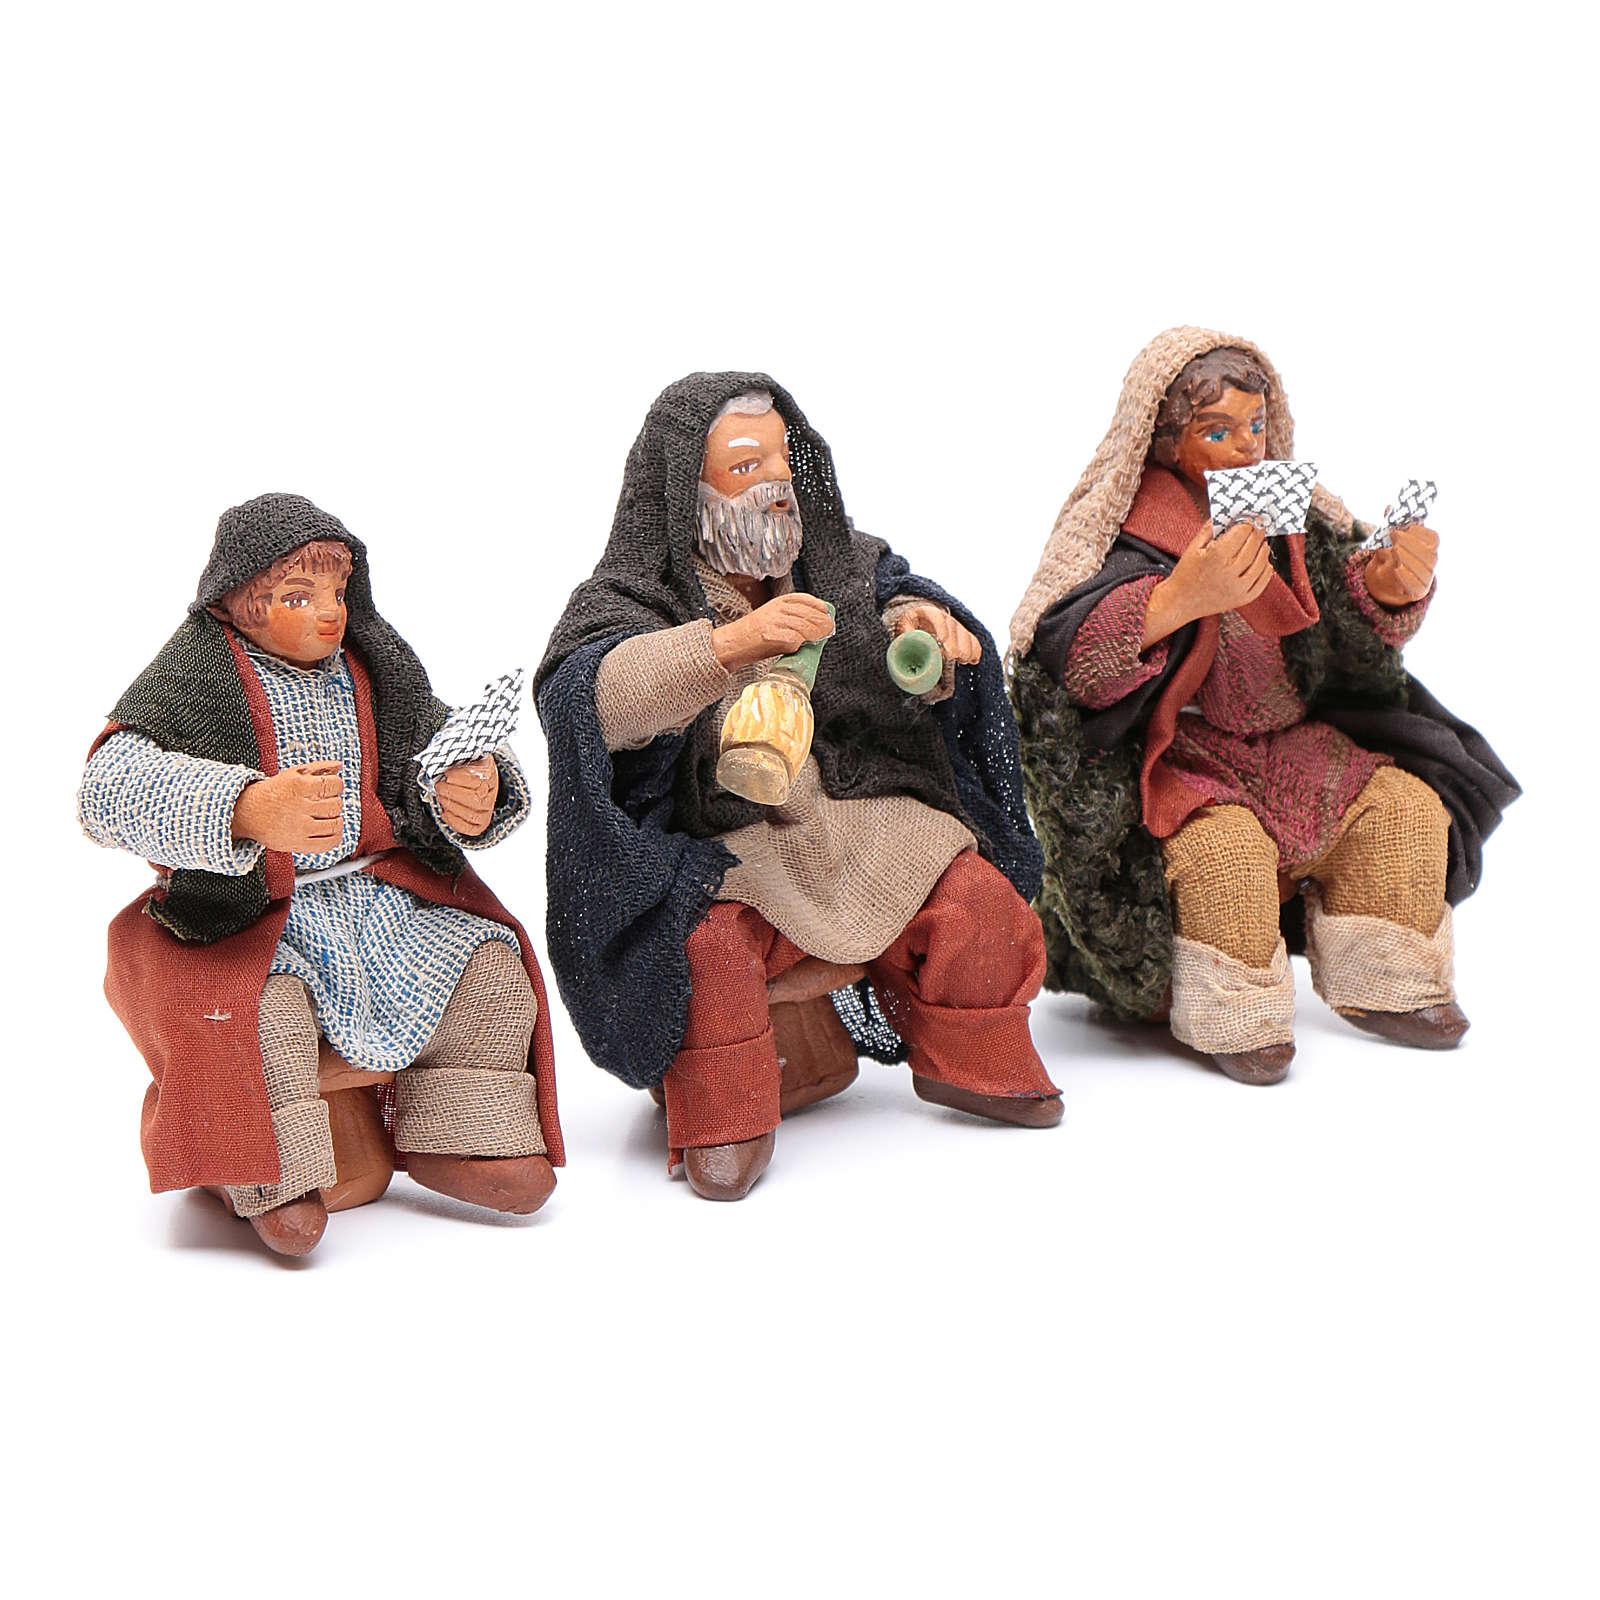 Cards players 3 figurines 10cm, Nativity Scene 4